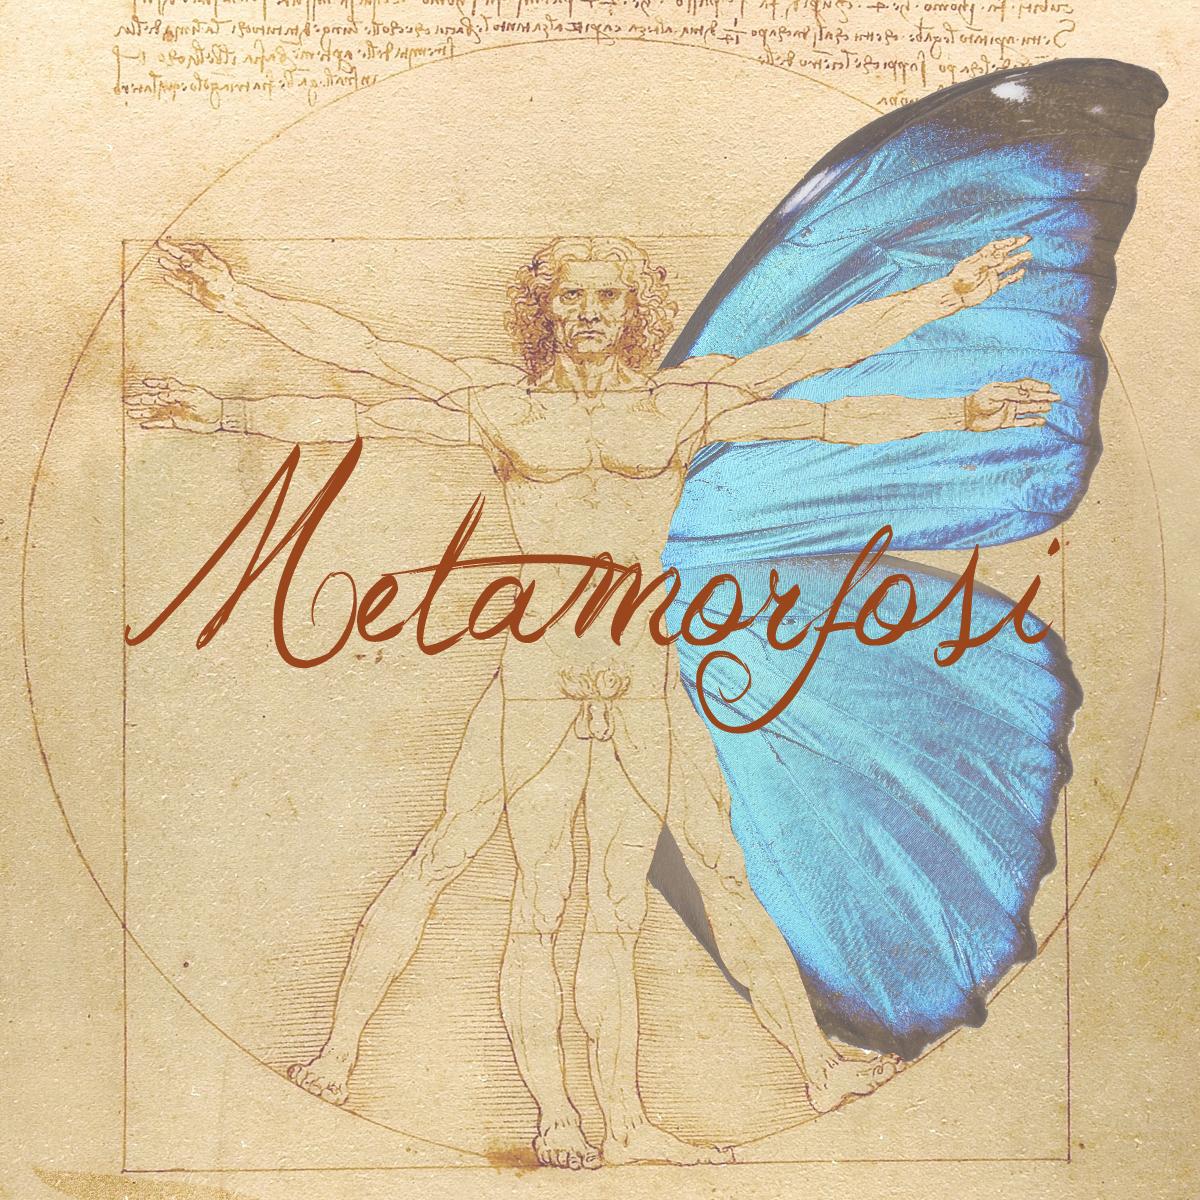 """Dal seme al fiore. Metamorfosi""  Labirinto Effimero 2014"